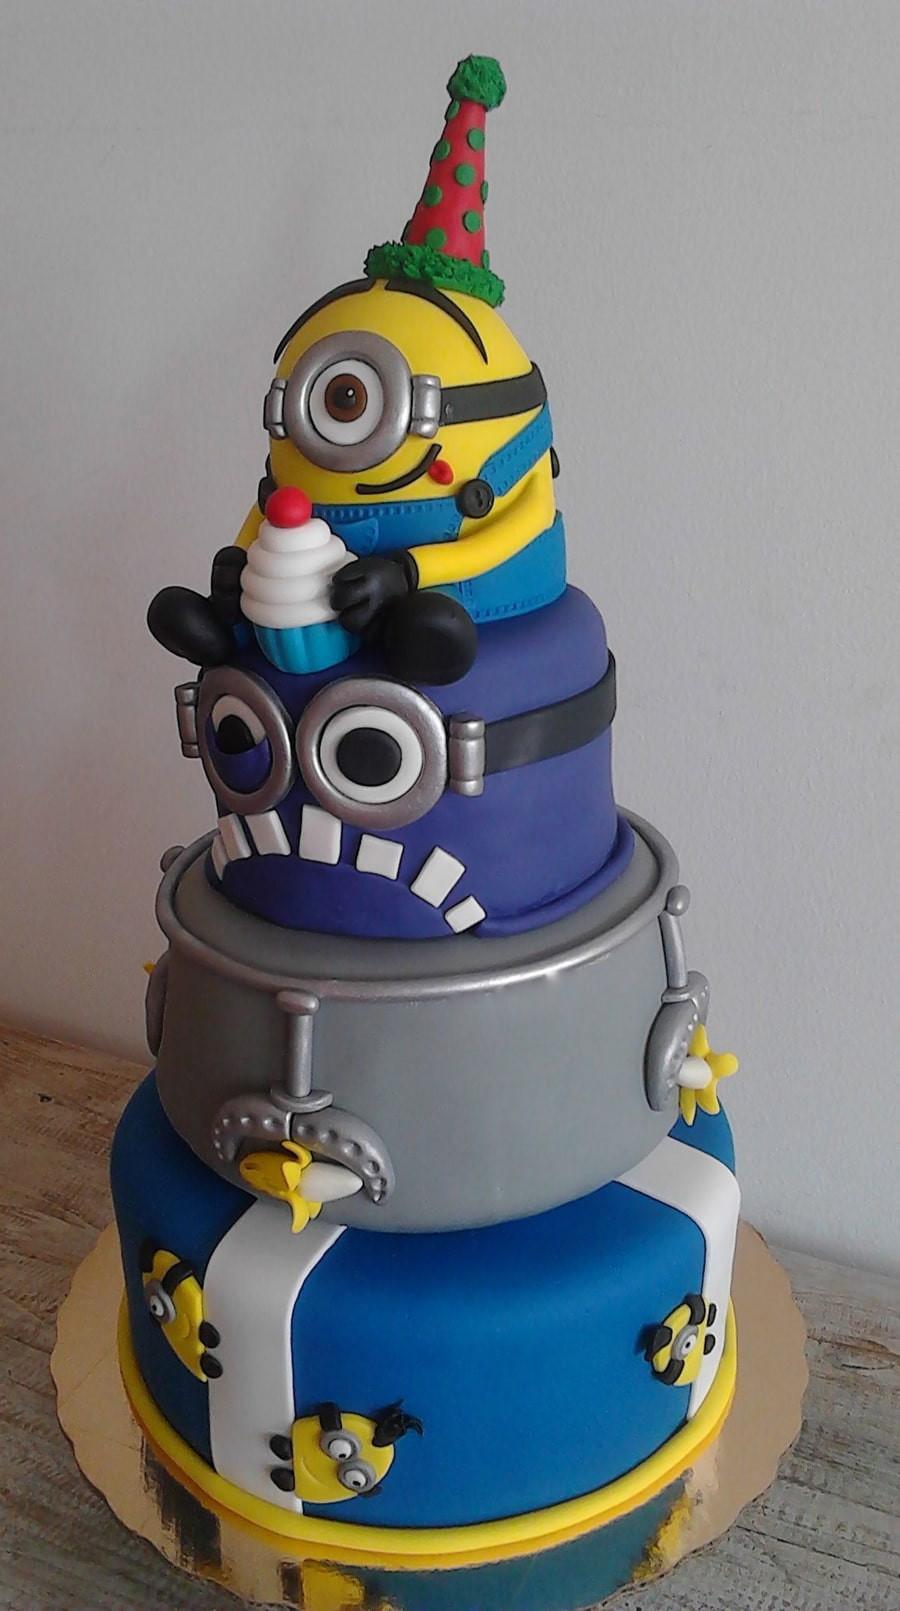 Minion Birthday Cake  10 Amazing Minion Birthday Cakes Pretty My Party Party